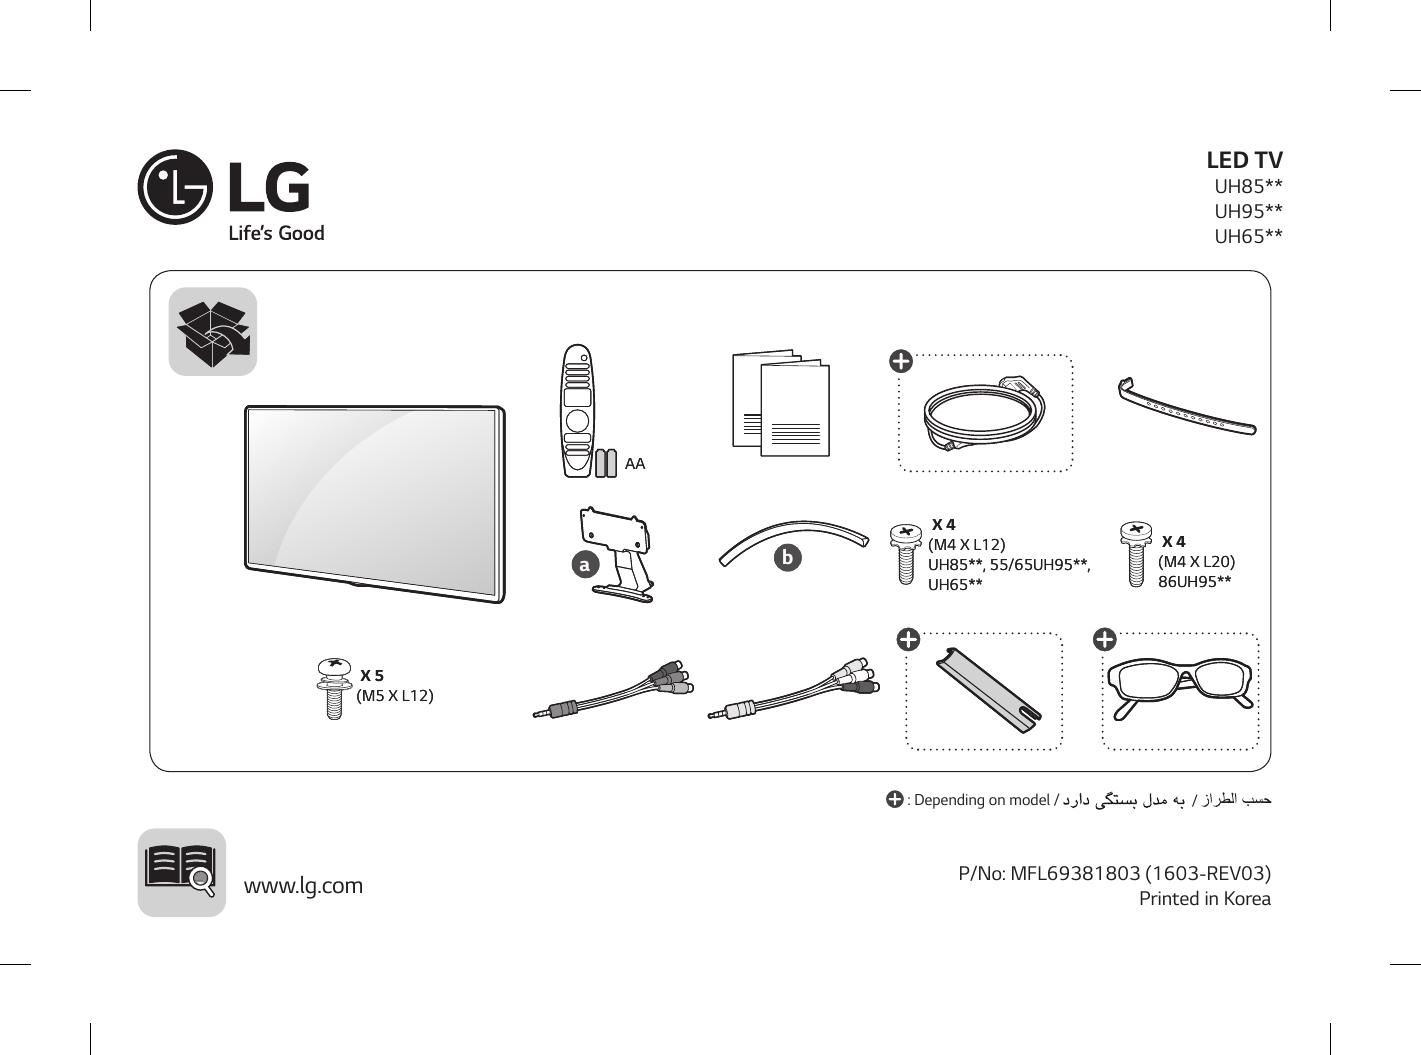 wiring lg diagram 55uh61 simple wiring diagram site  wiring lg diagram 55uh61 wiring diagrams scematic lg 49uh850v owner\u0027s manual manualzz com wiring lg diagram